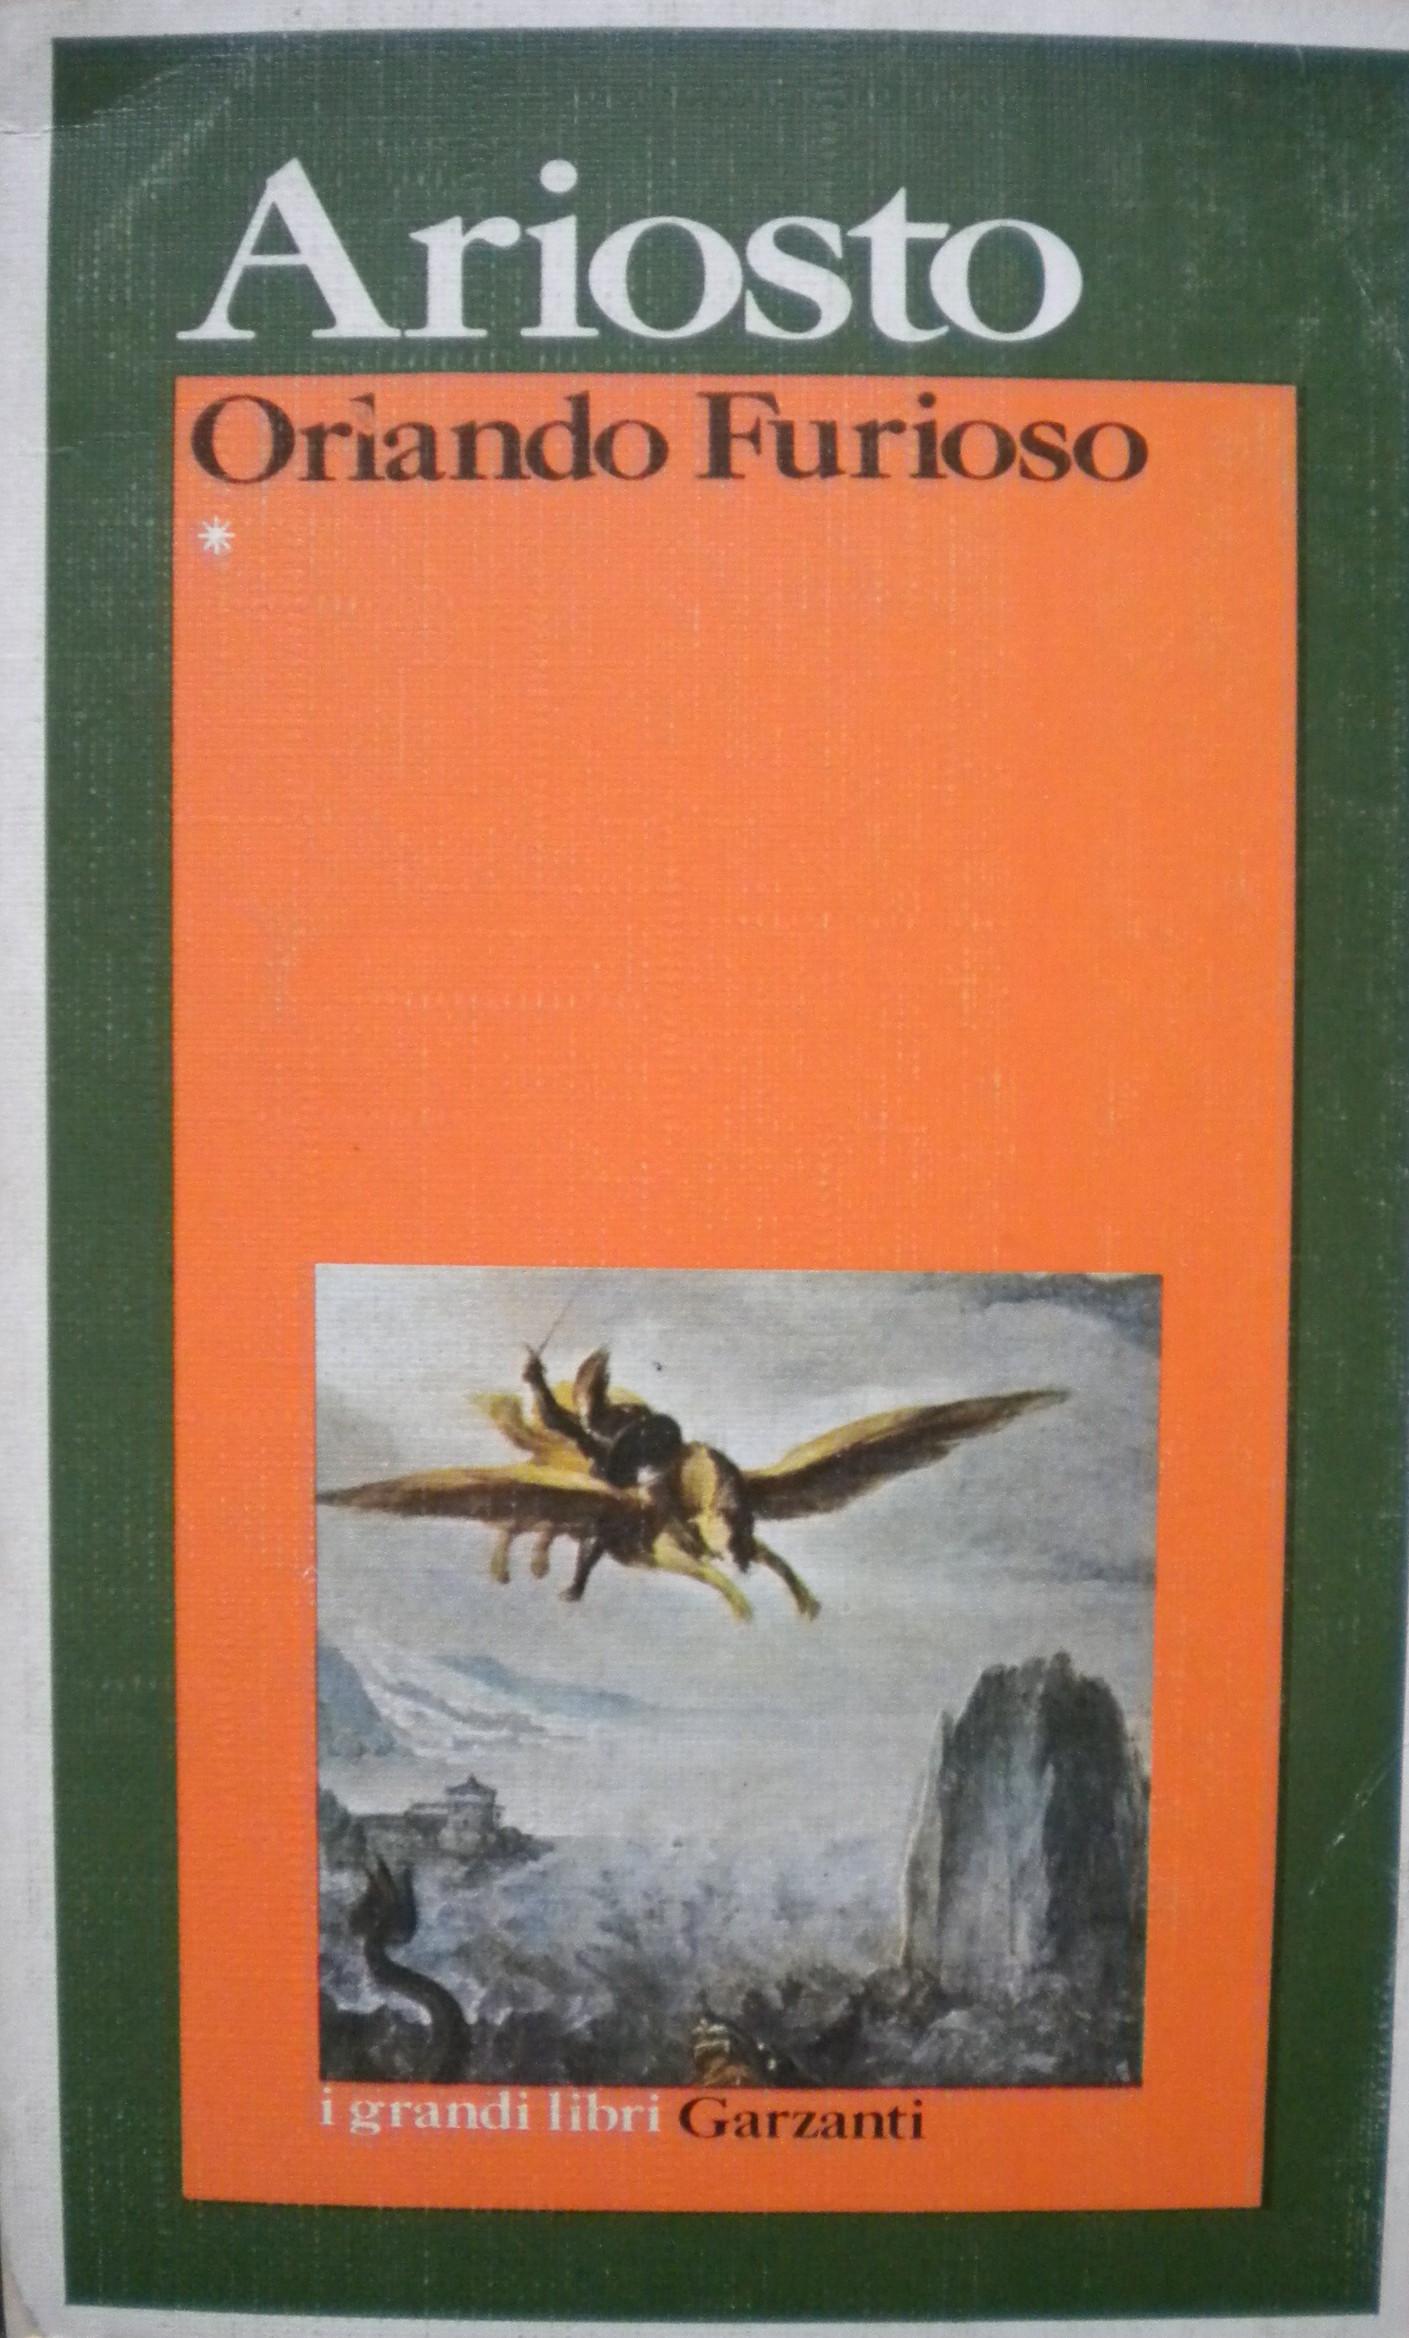 Orlando furioso - Volume primo